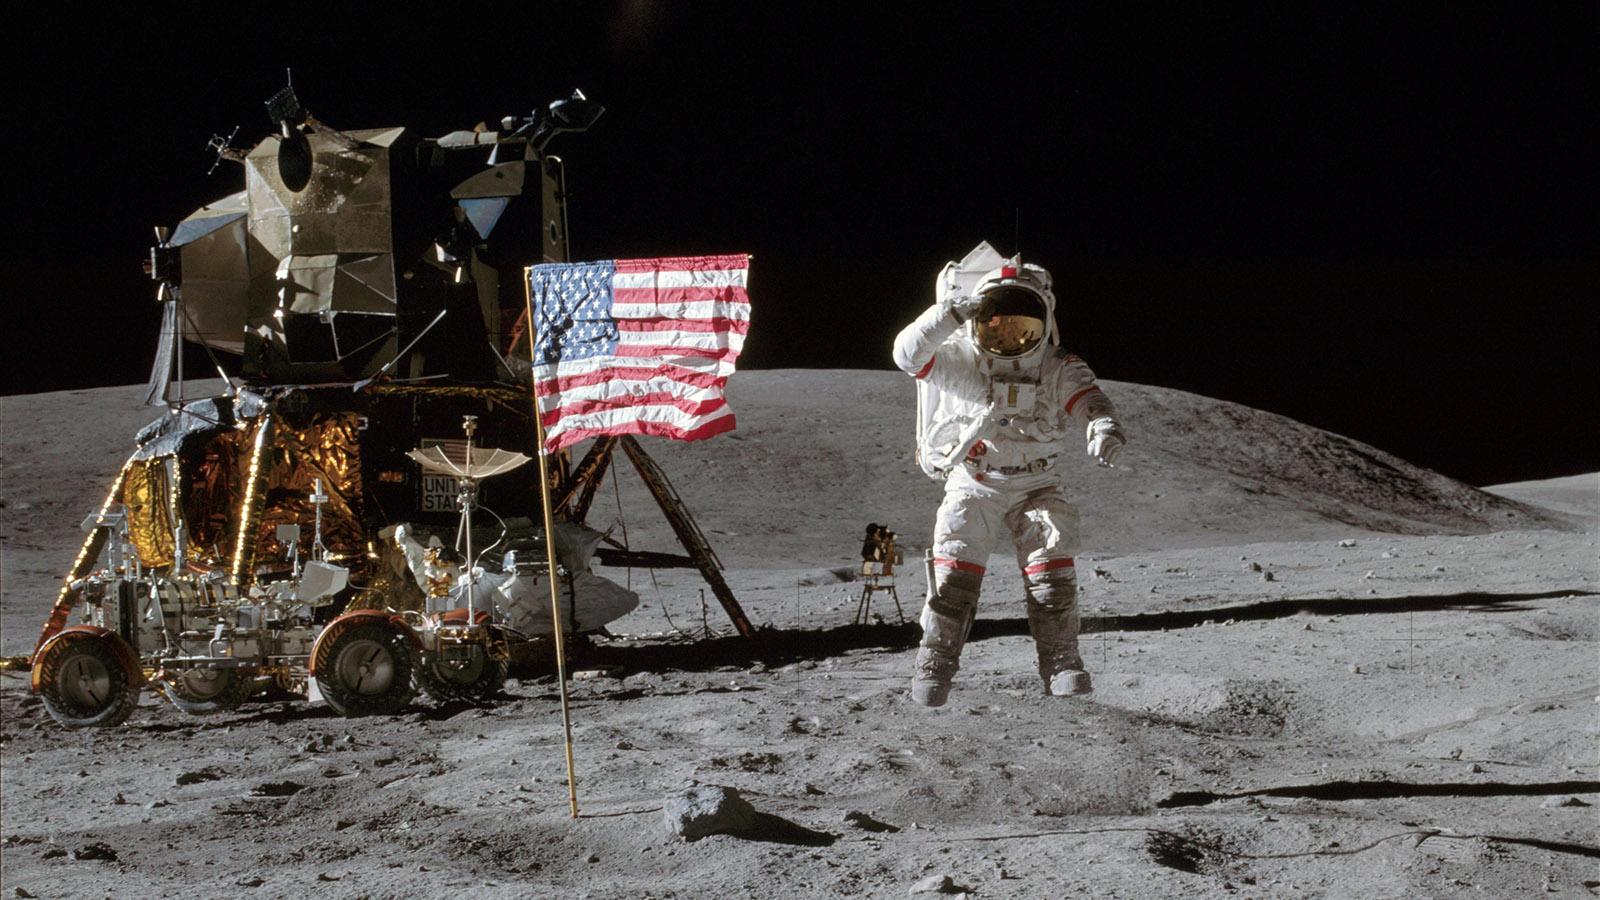 NASA登月是真是假?中國已經兩次給出了證明,結論一致